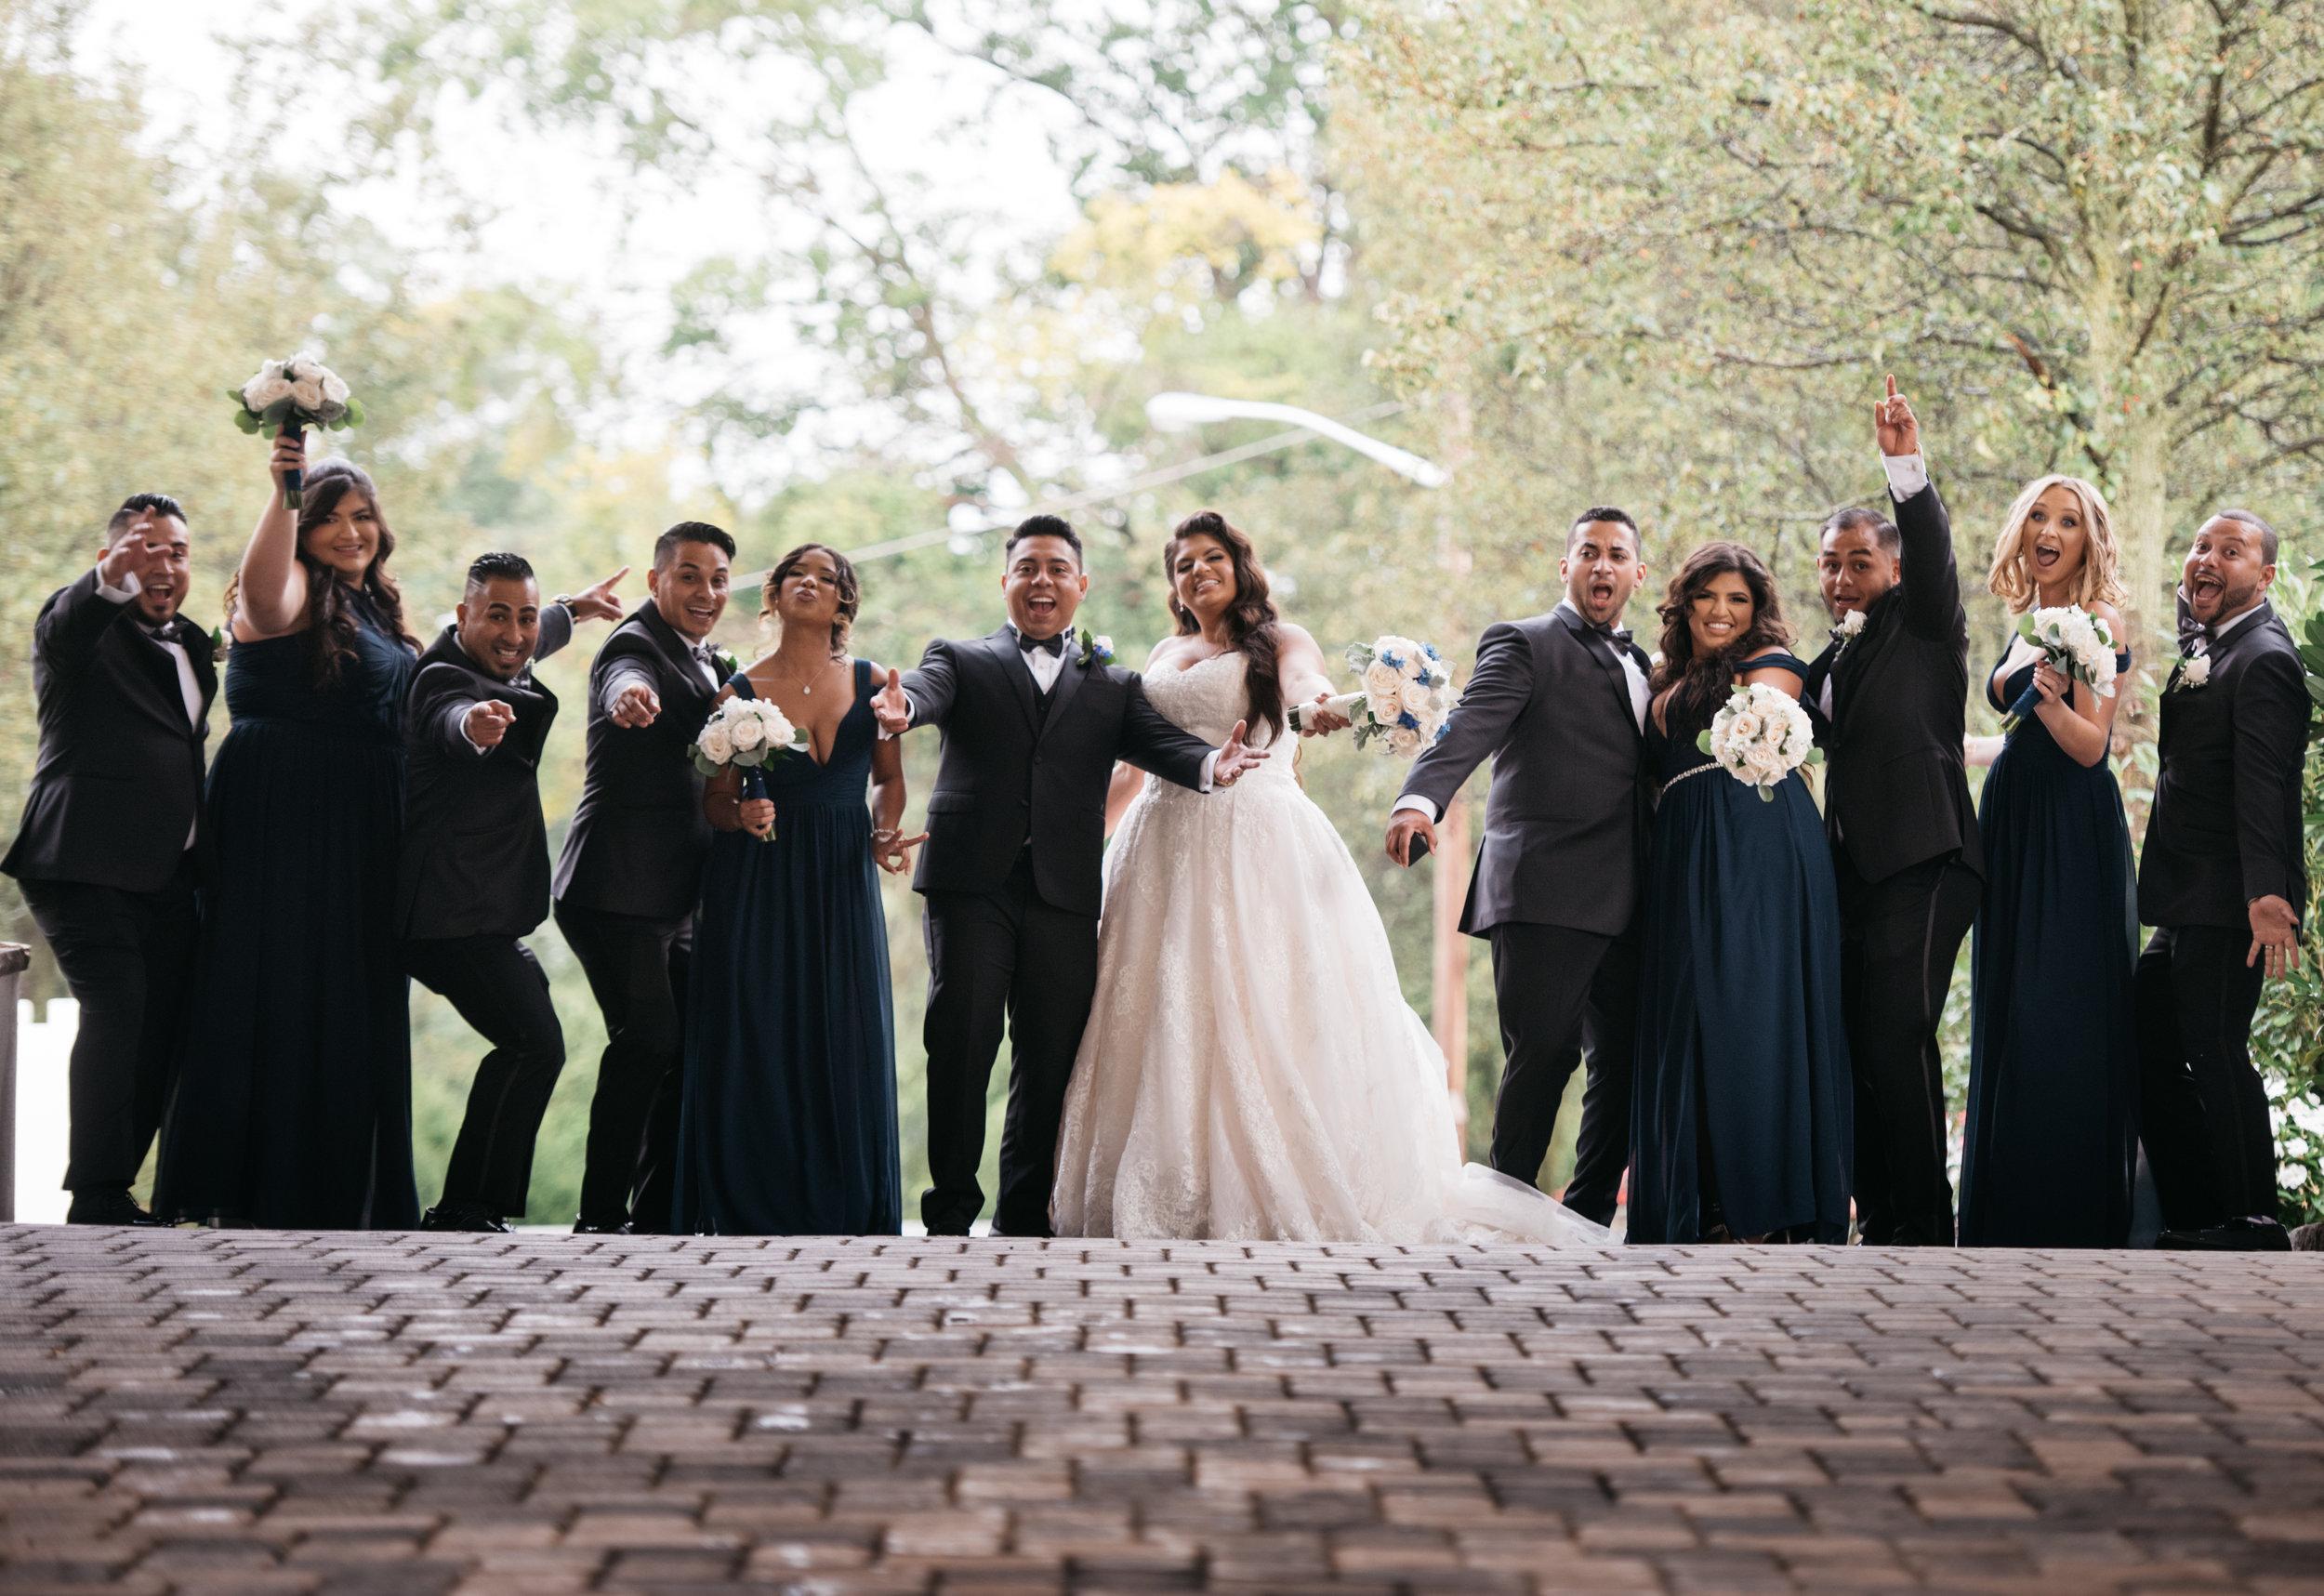 WeddingPhotos | NJPhotographer | Highlights-5-21.jpg